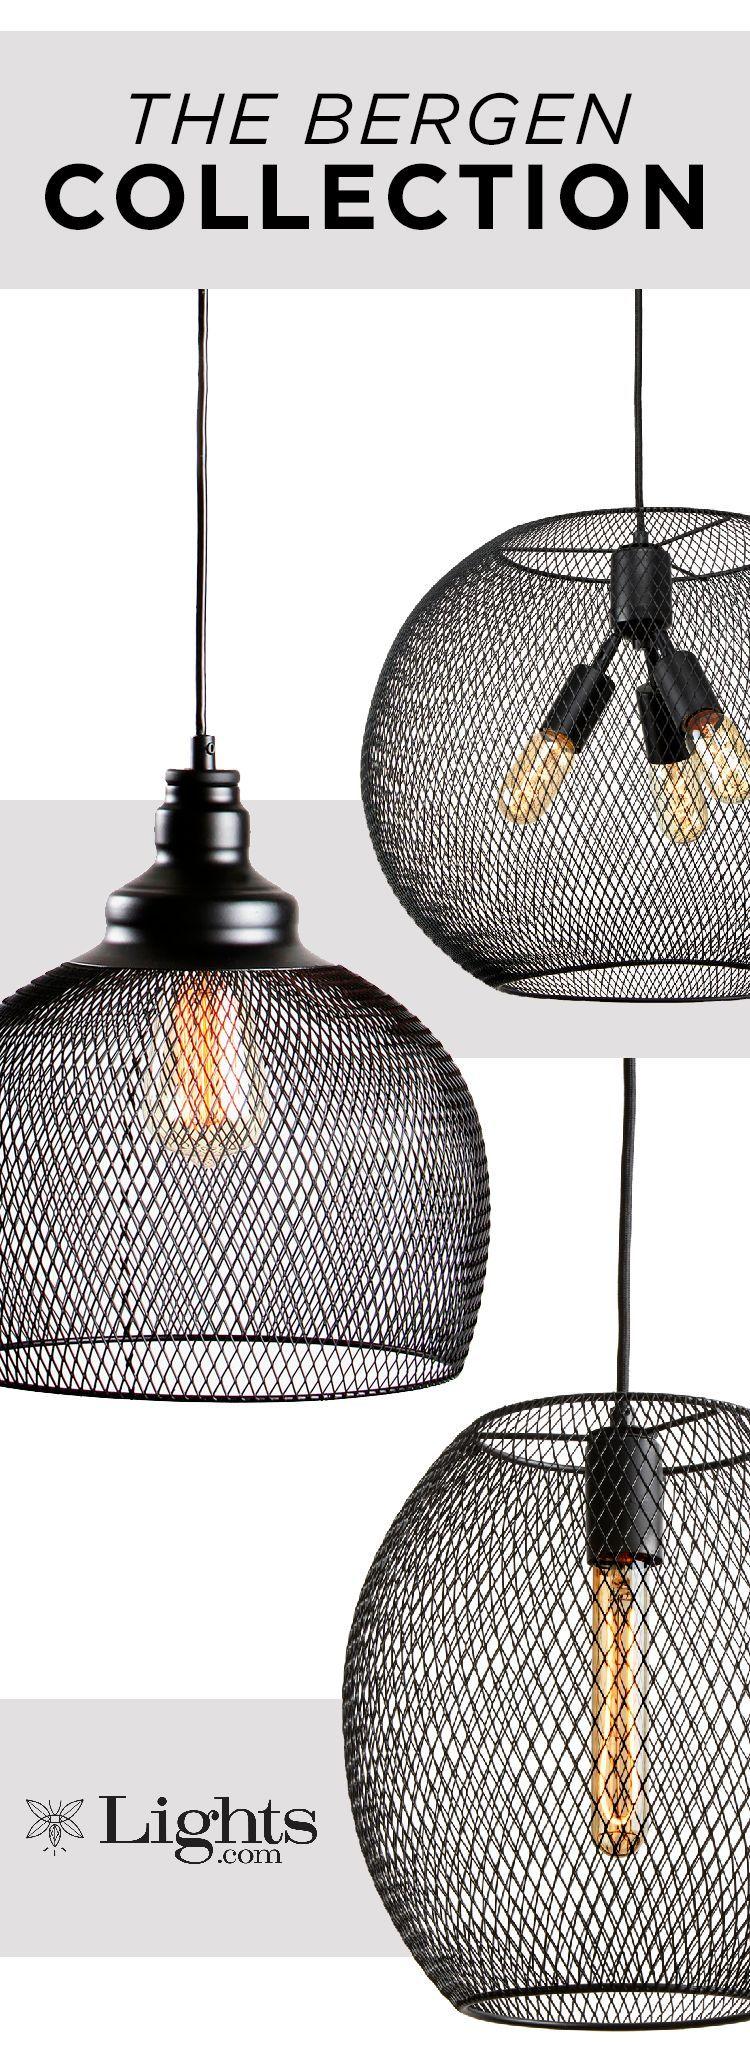 Bergen Globe Pendant Matte Black In 2021 Black Wall Lamps Pendant Lighting Bedroom Large Round Pendant Light